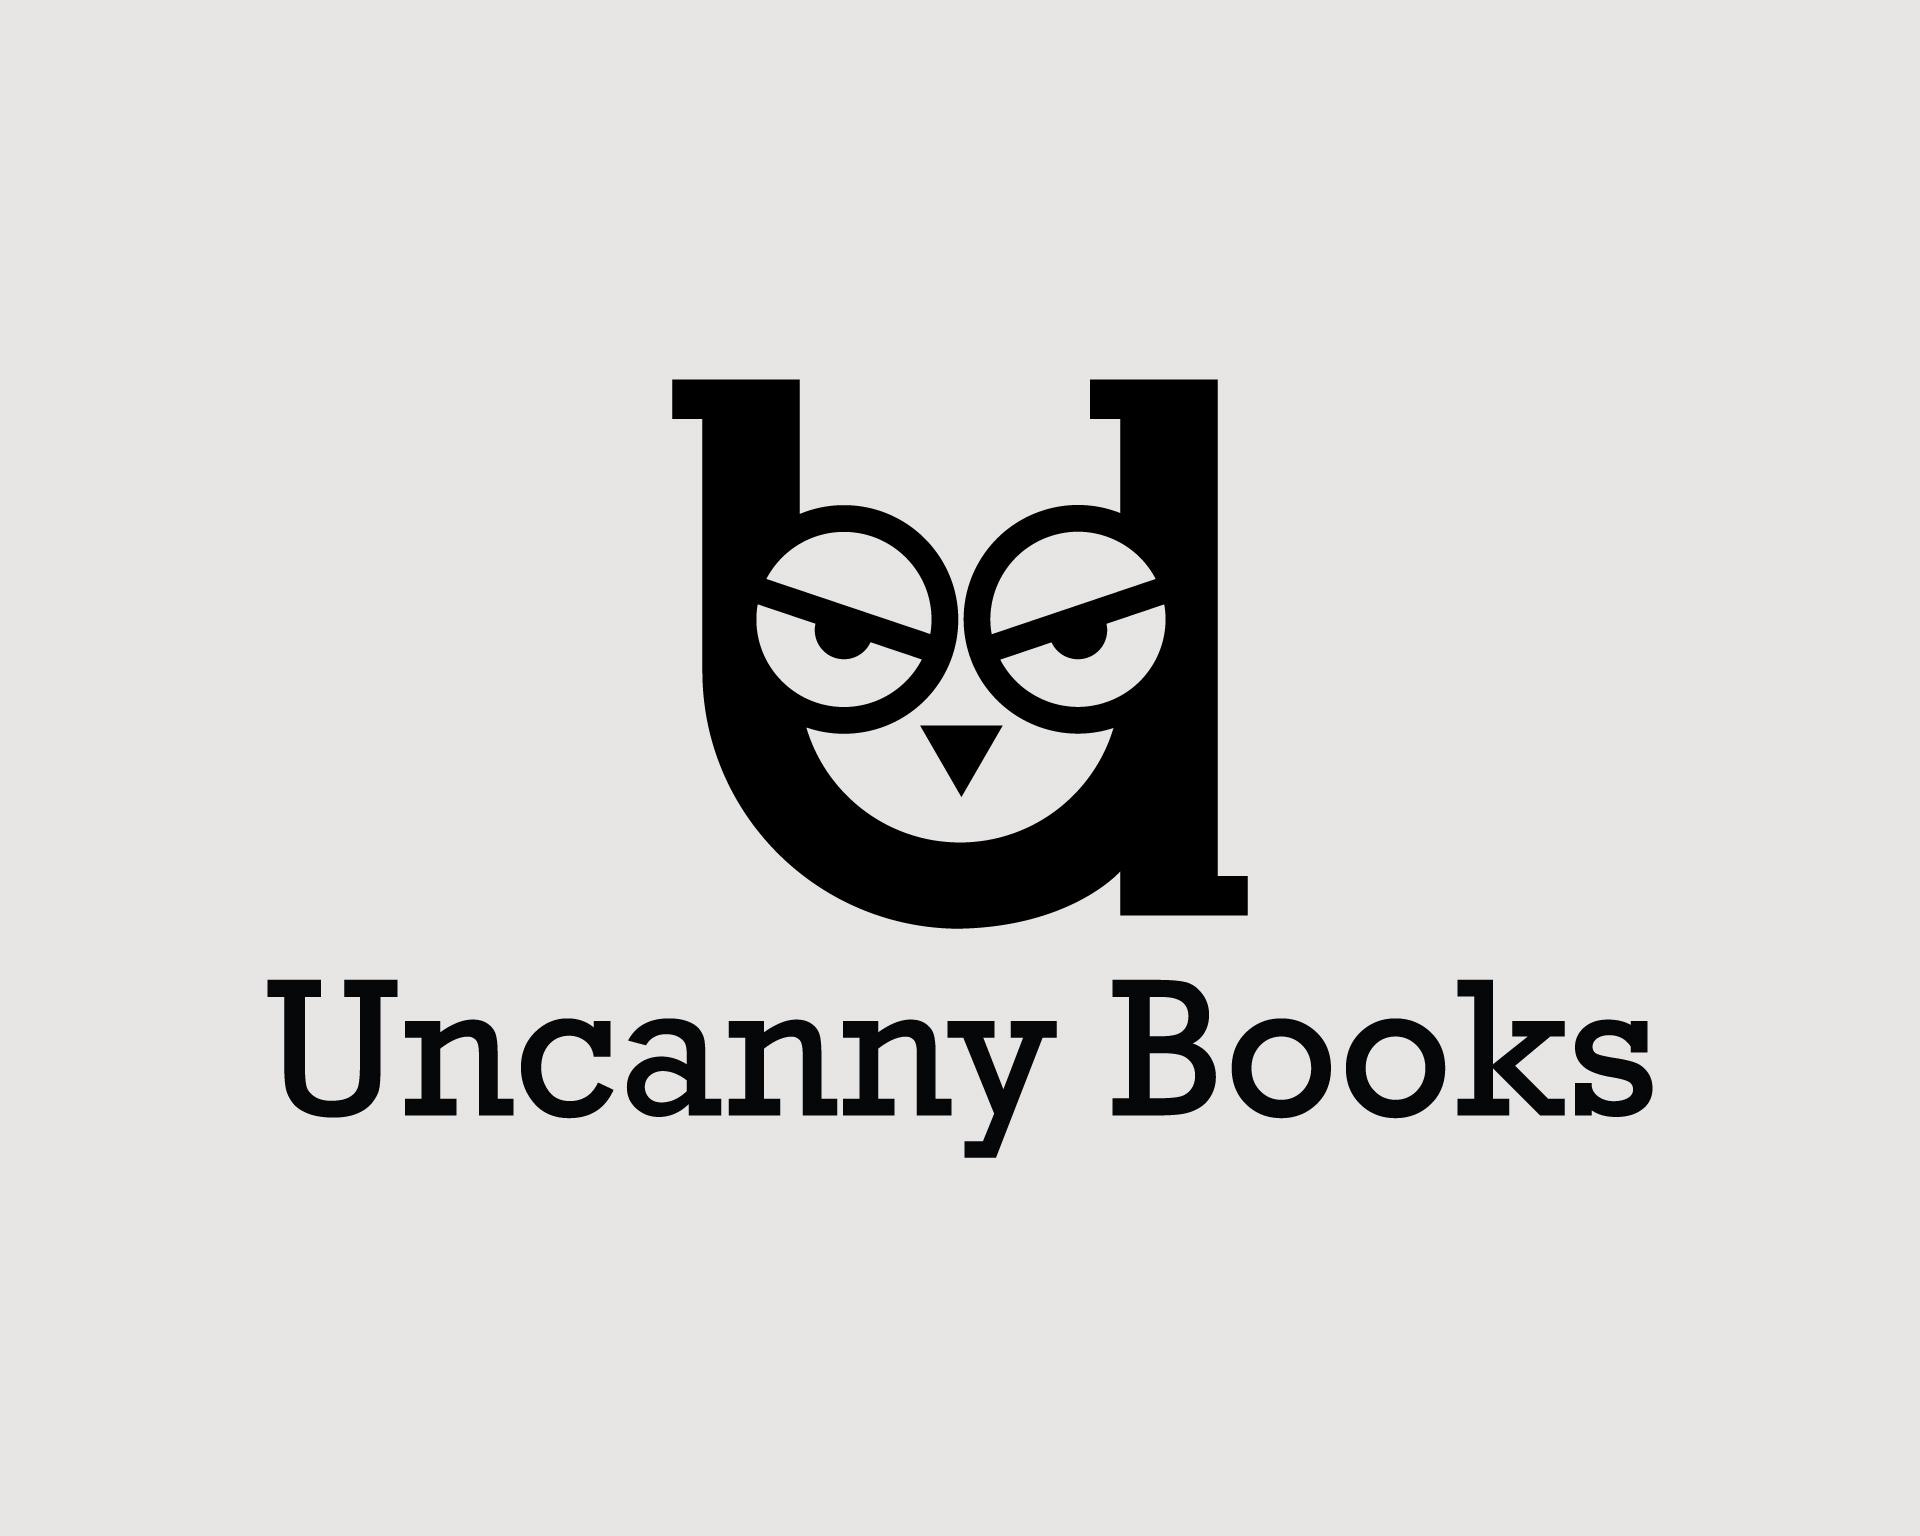 uncanny-books-02